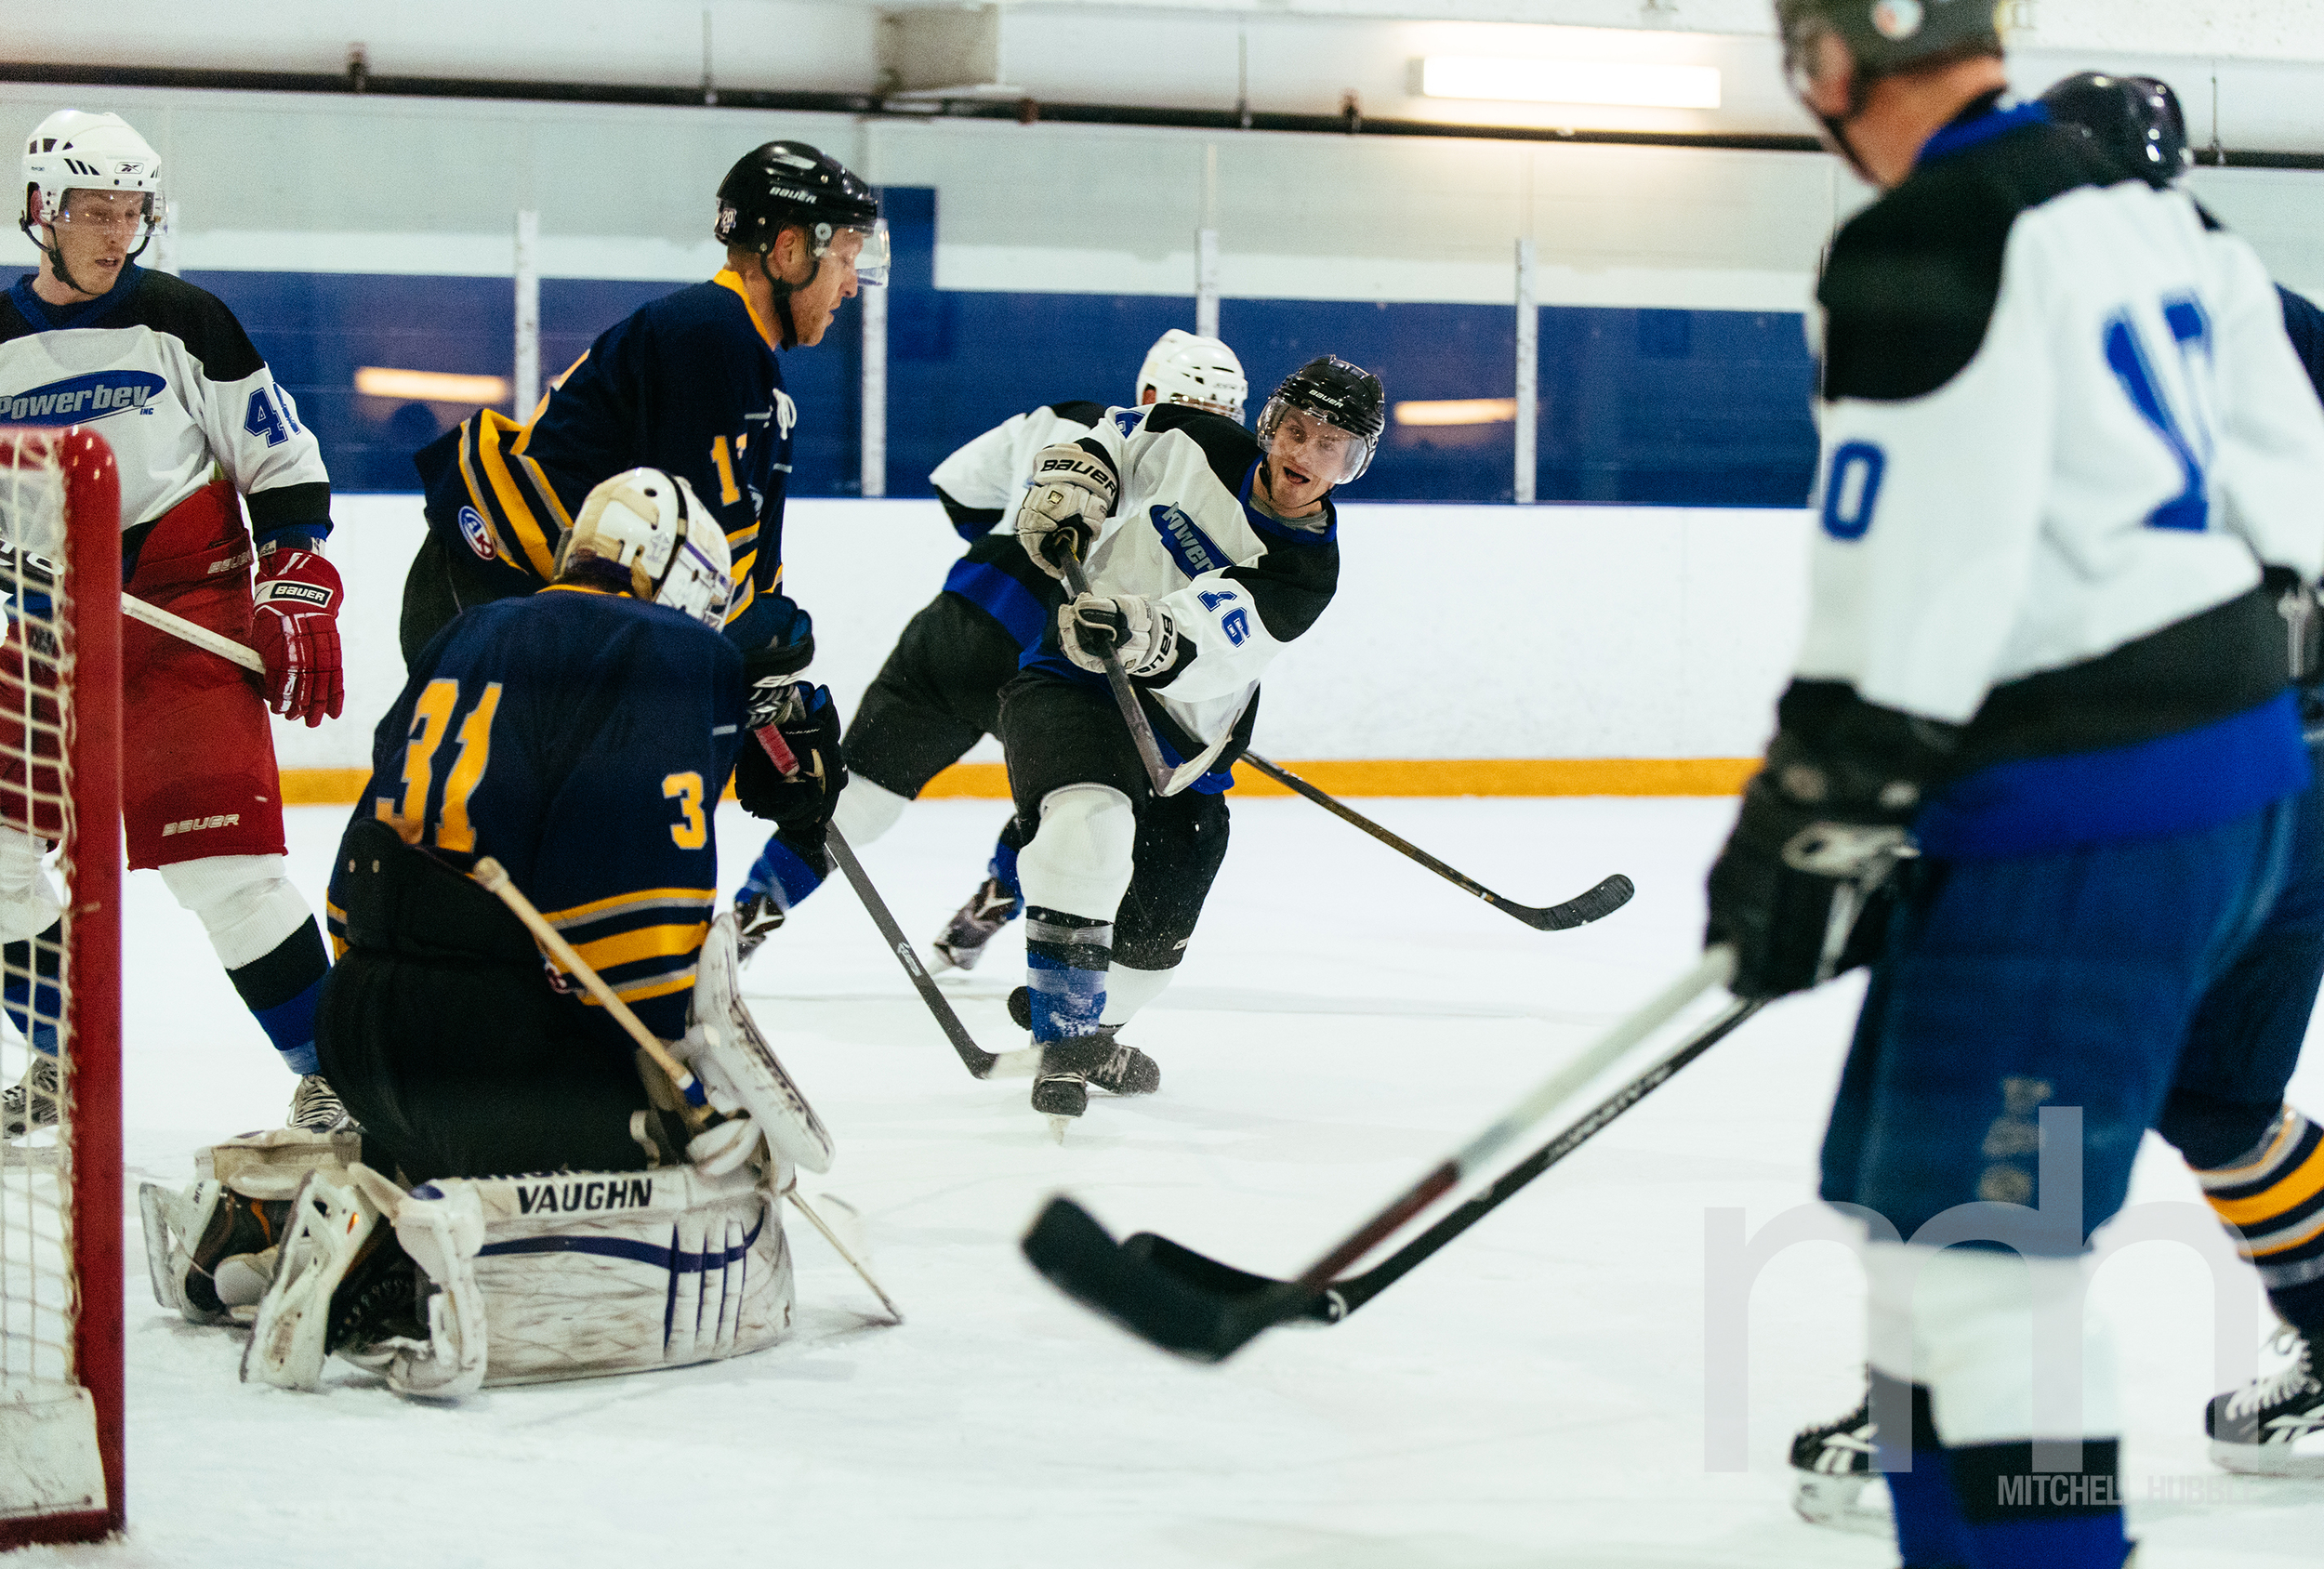 RB_Hockey-40.jpg